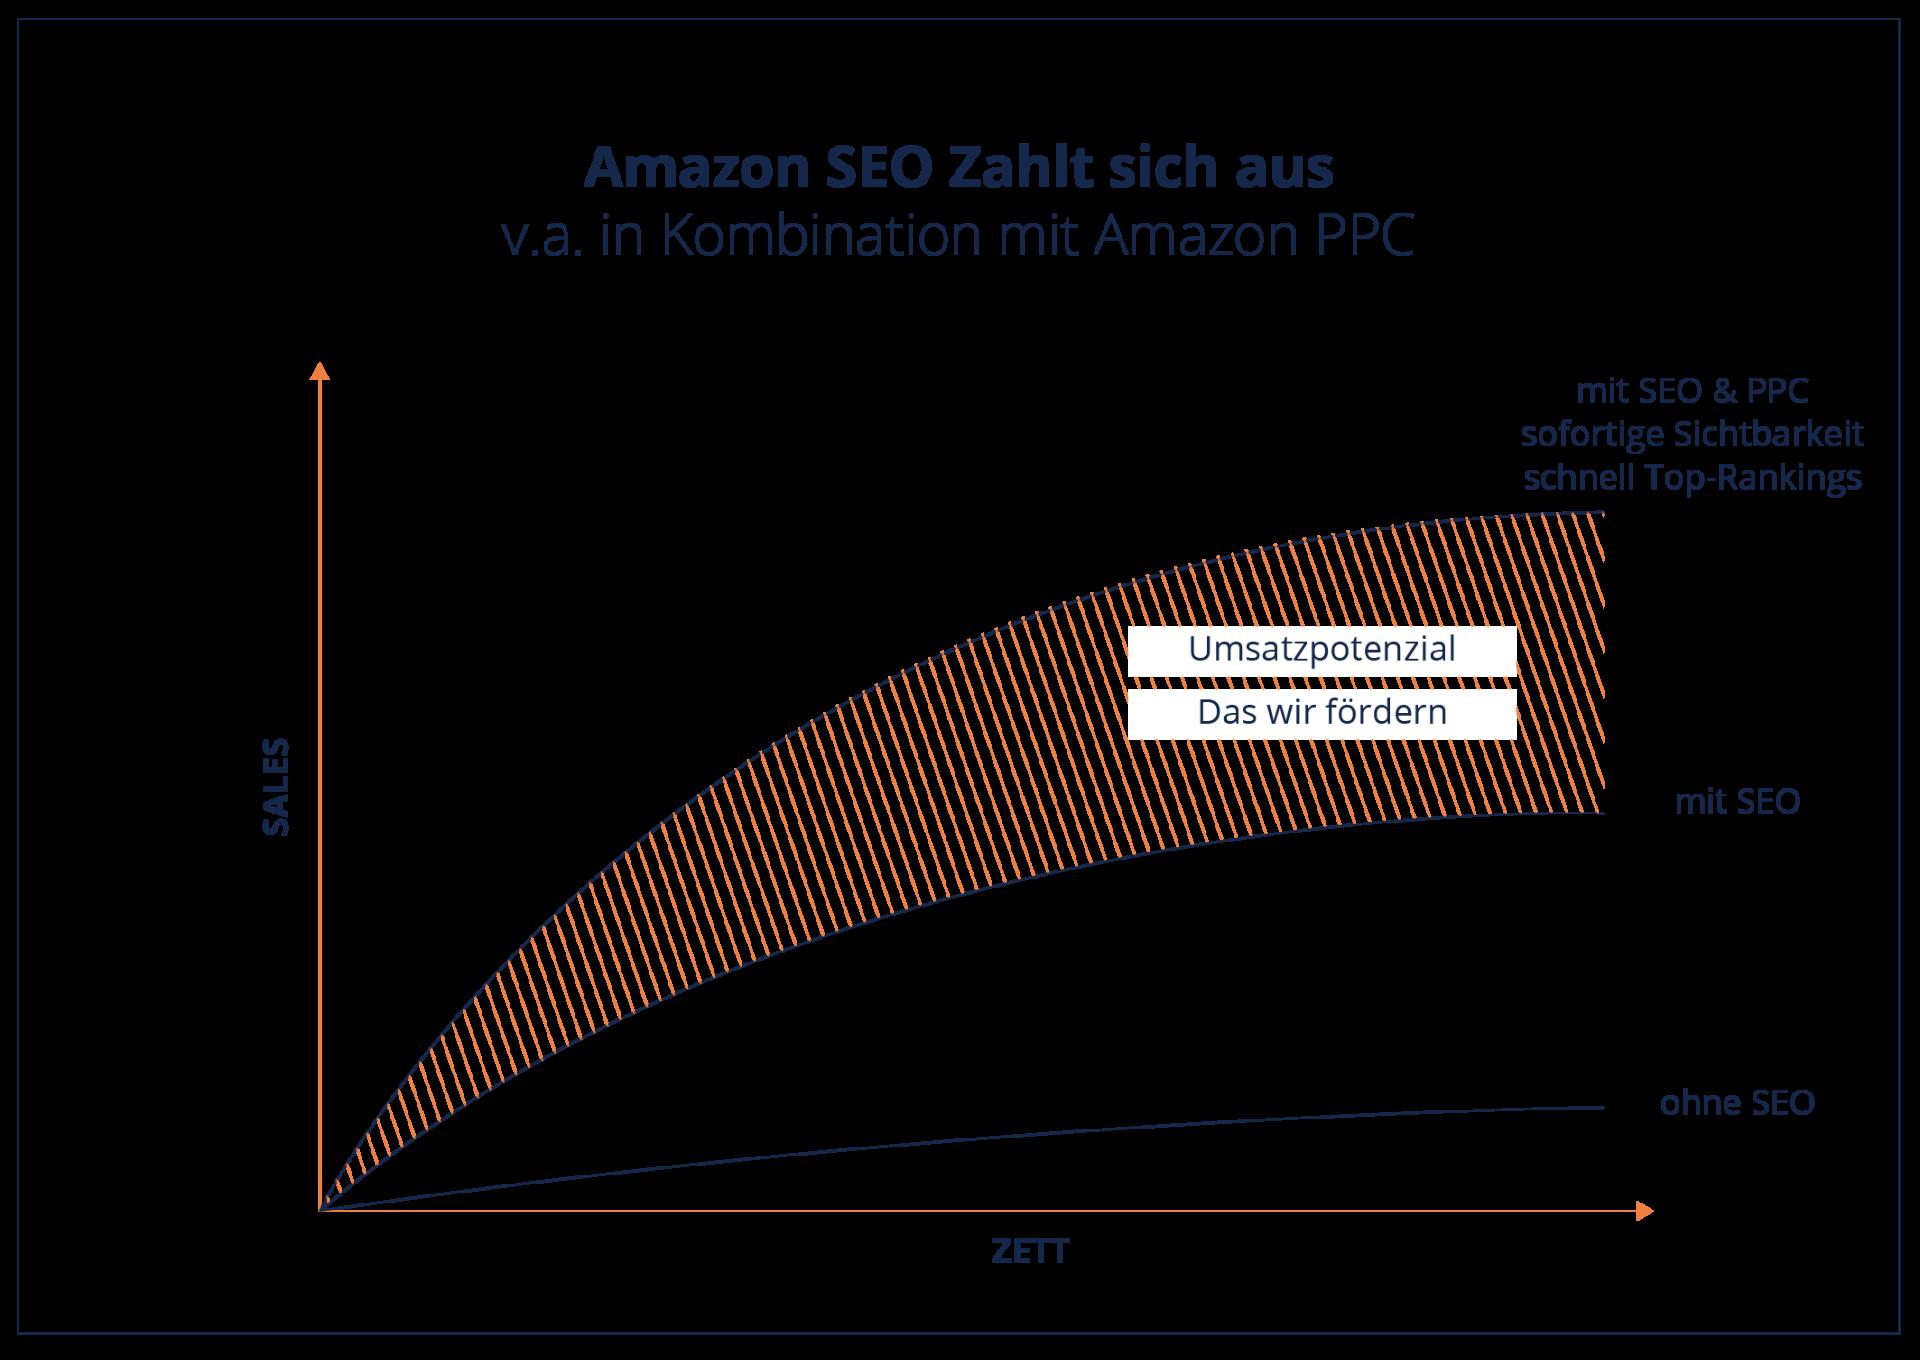 Infografik Amazon SEO zahlt sich aus